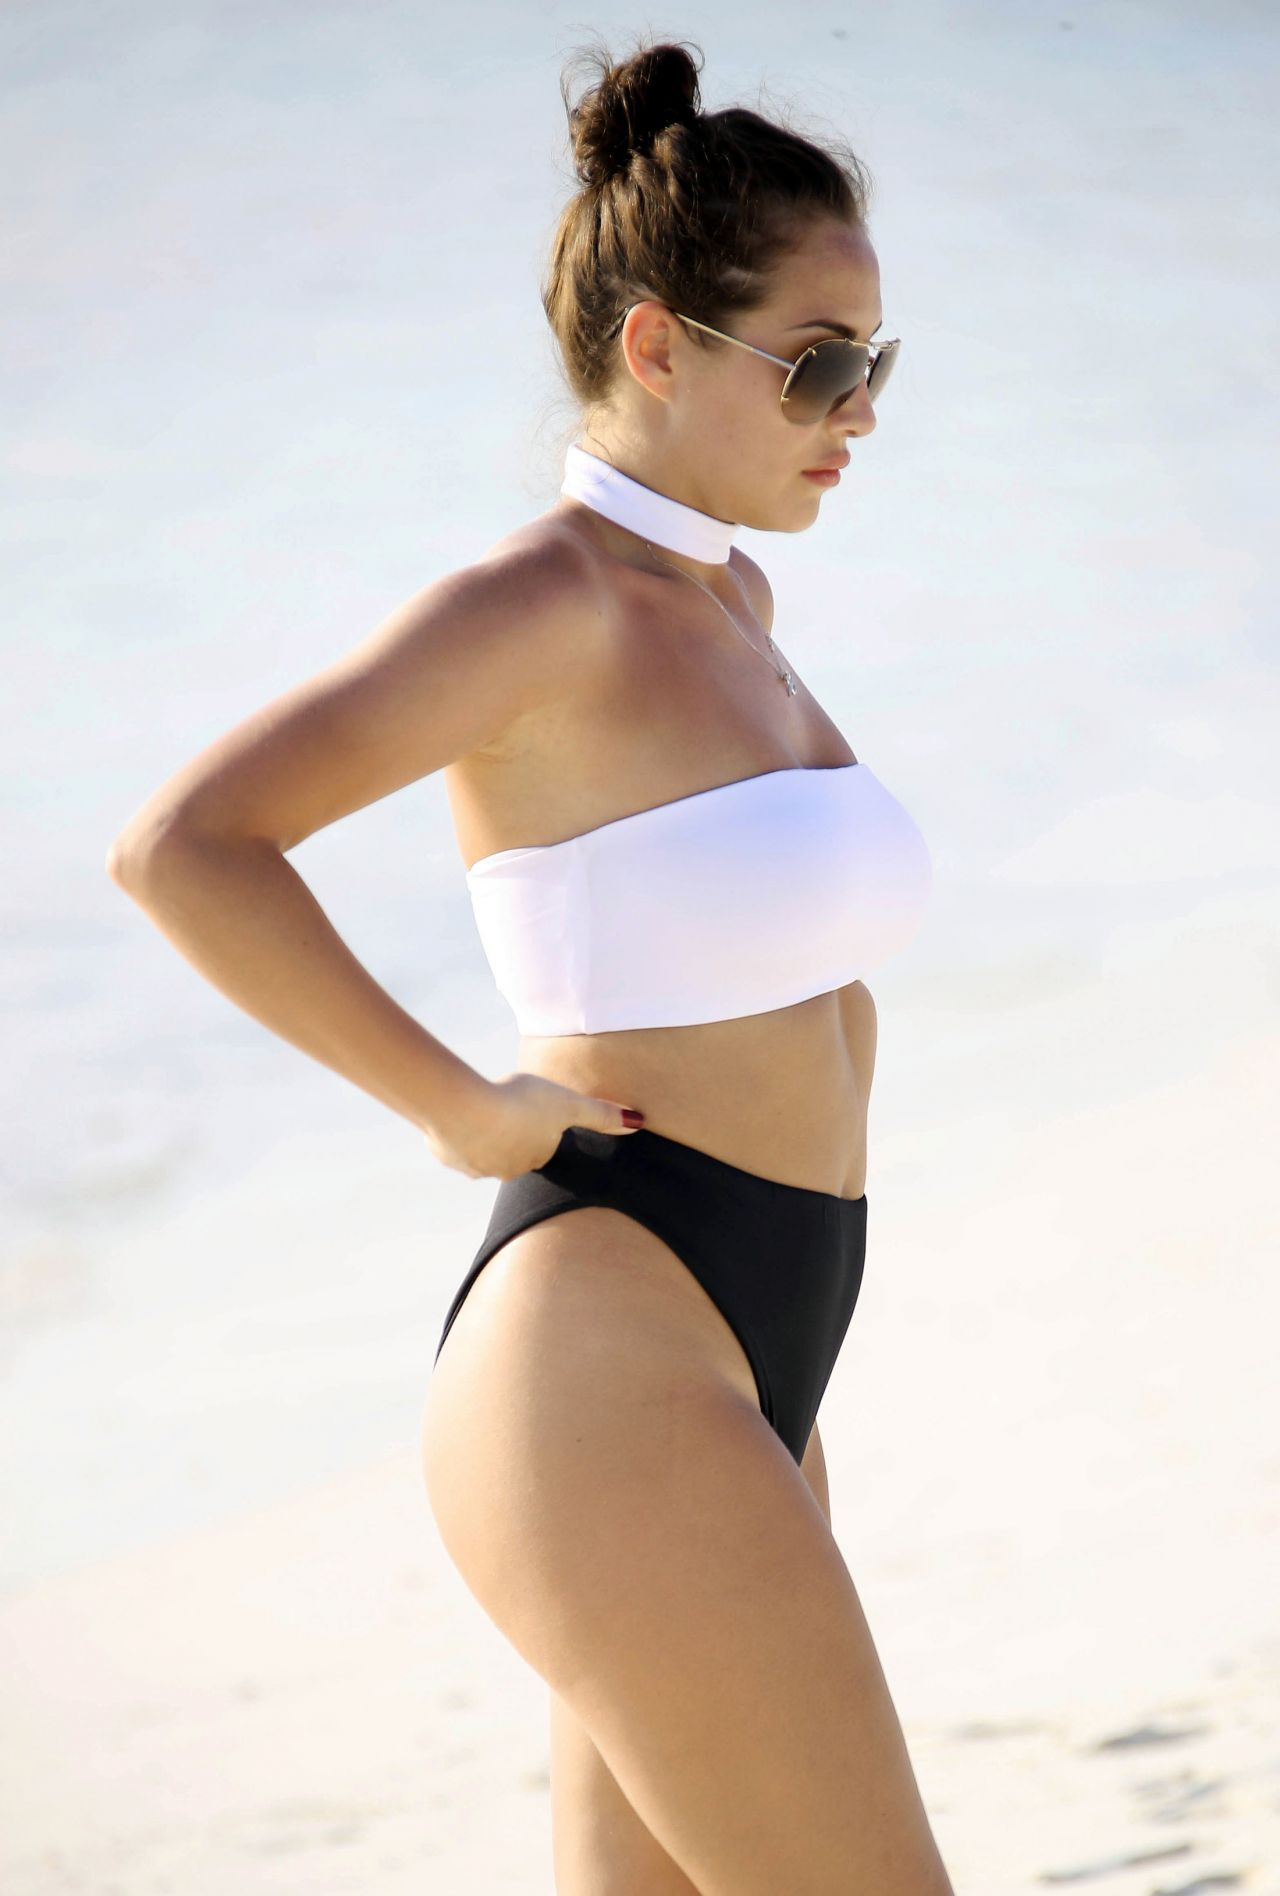 Love julia stiles bikini Geil